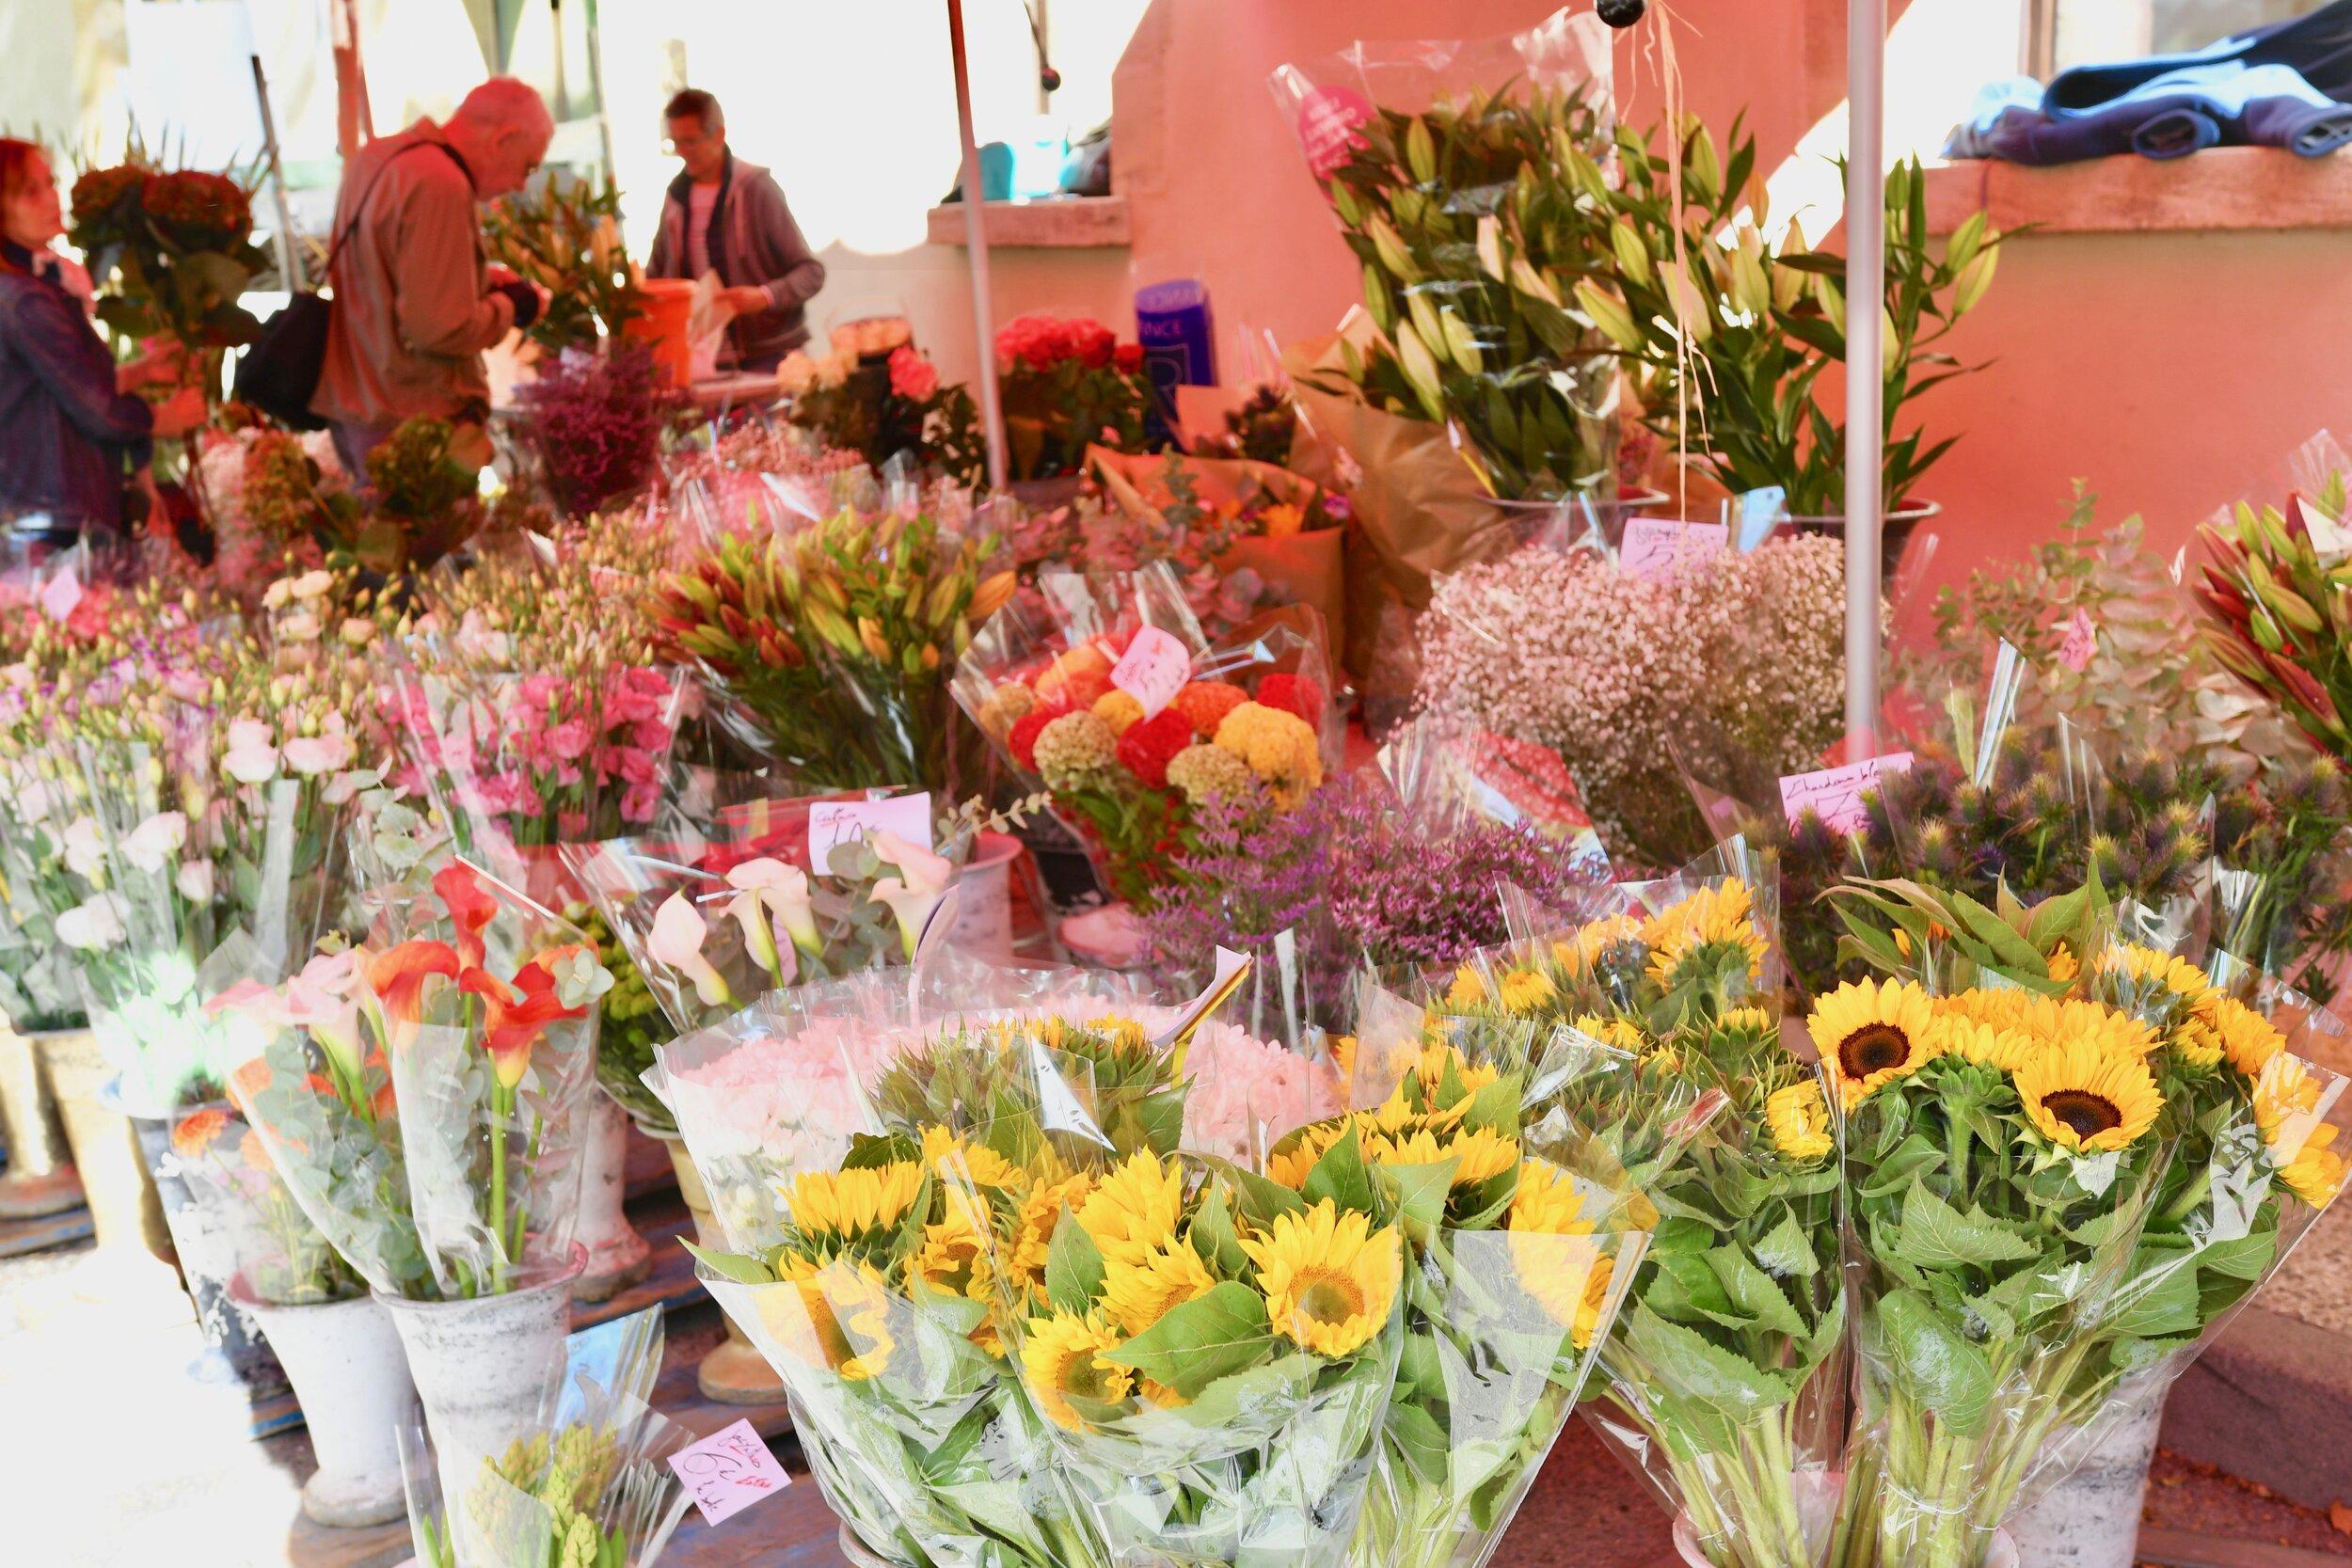 Market Day in Lourmarin - Crazy Blonde Life